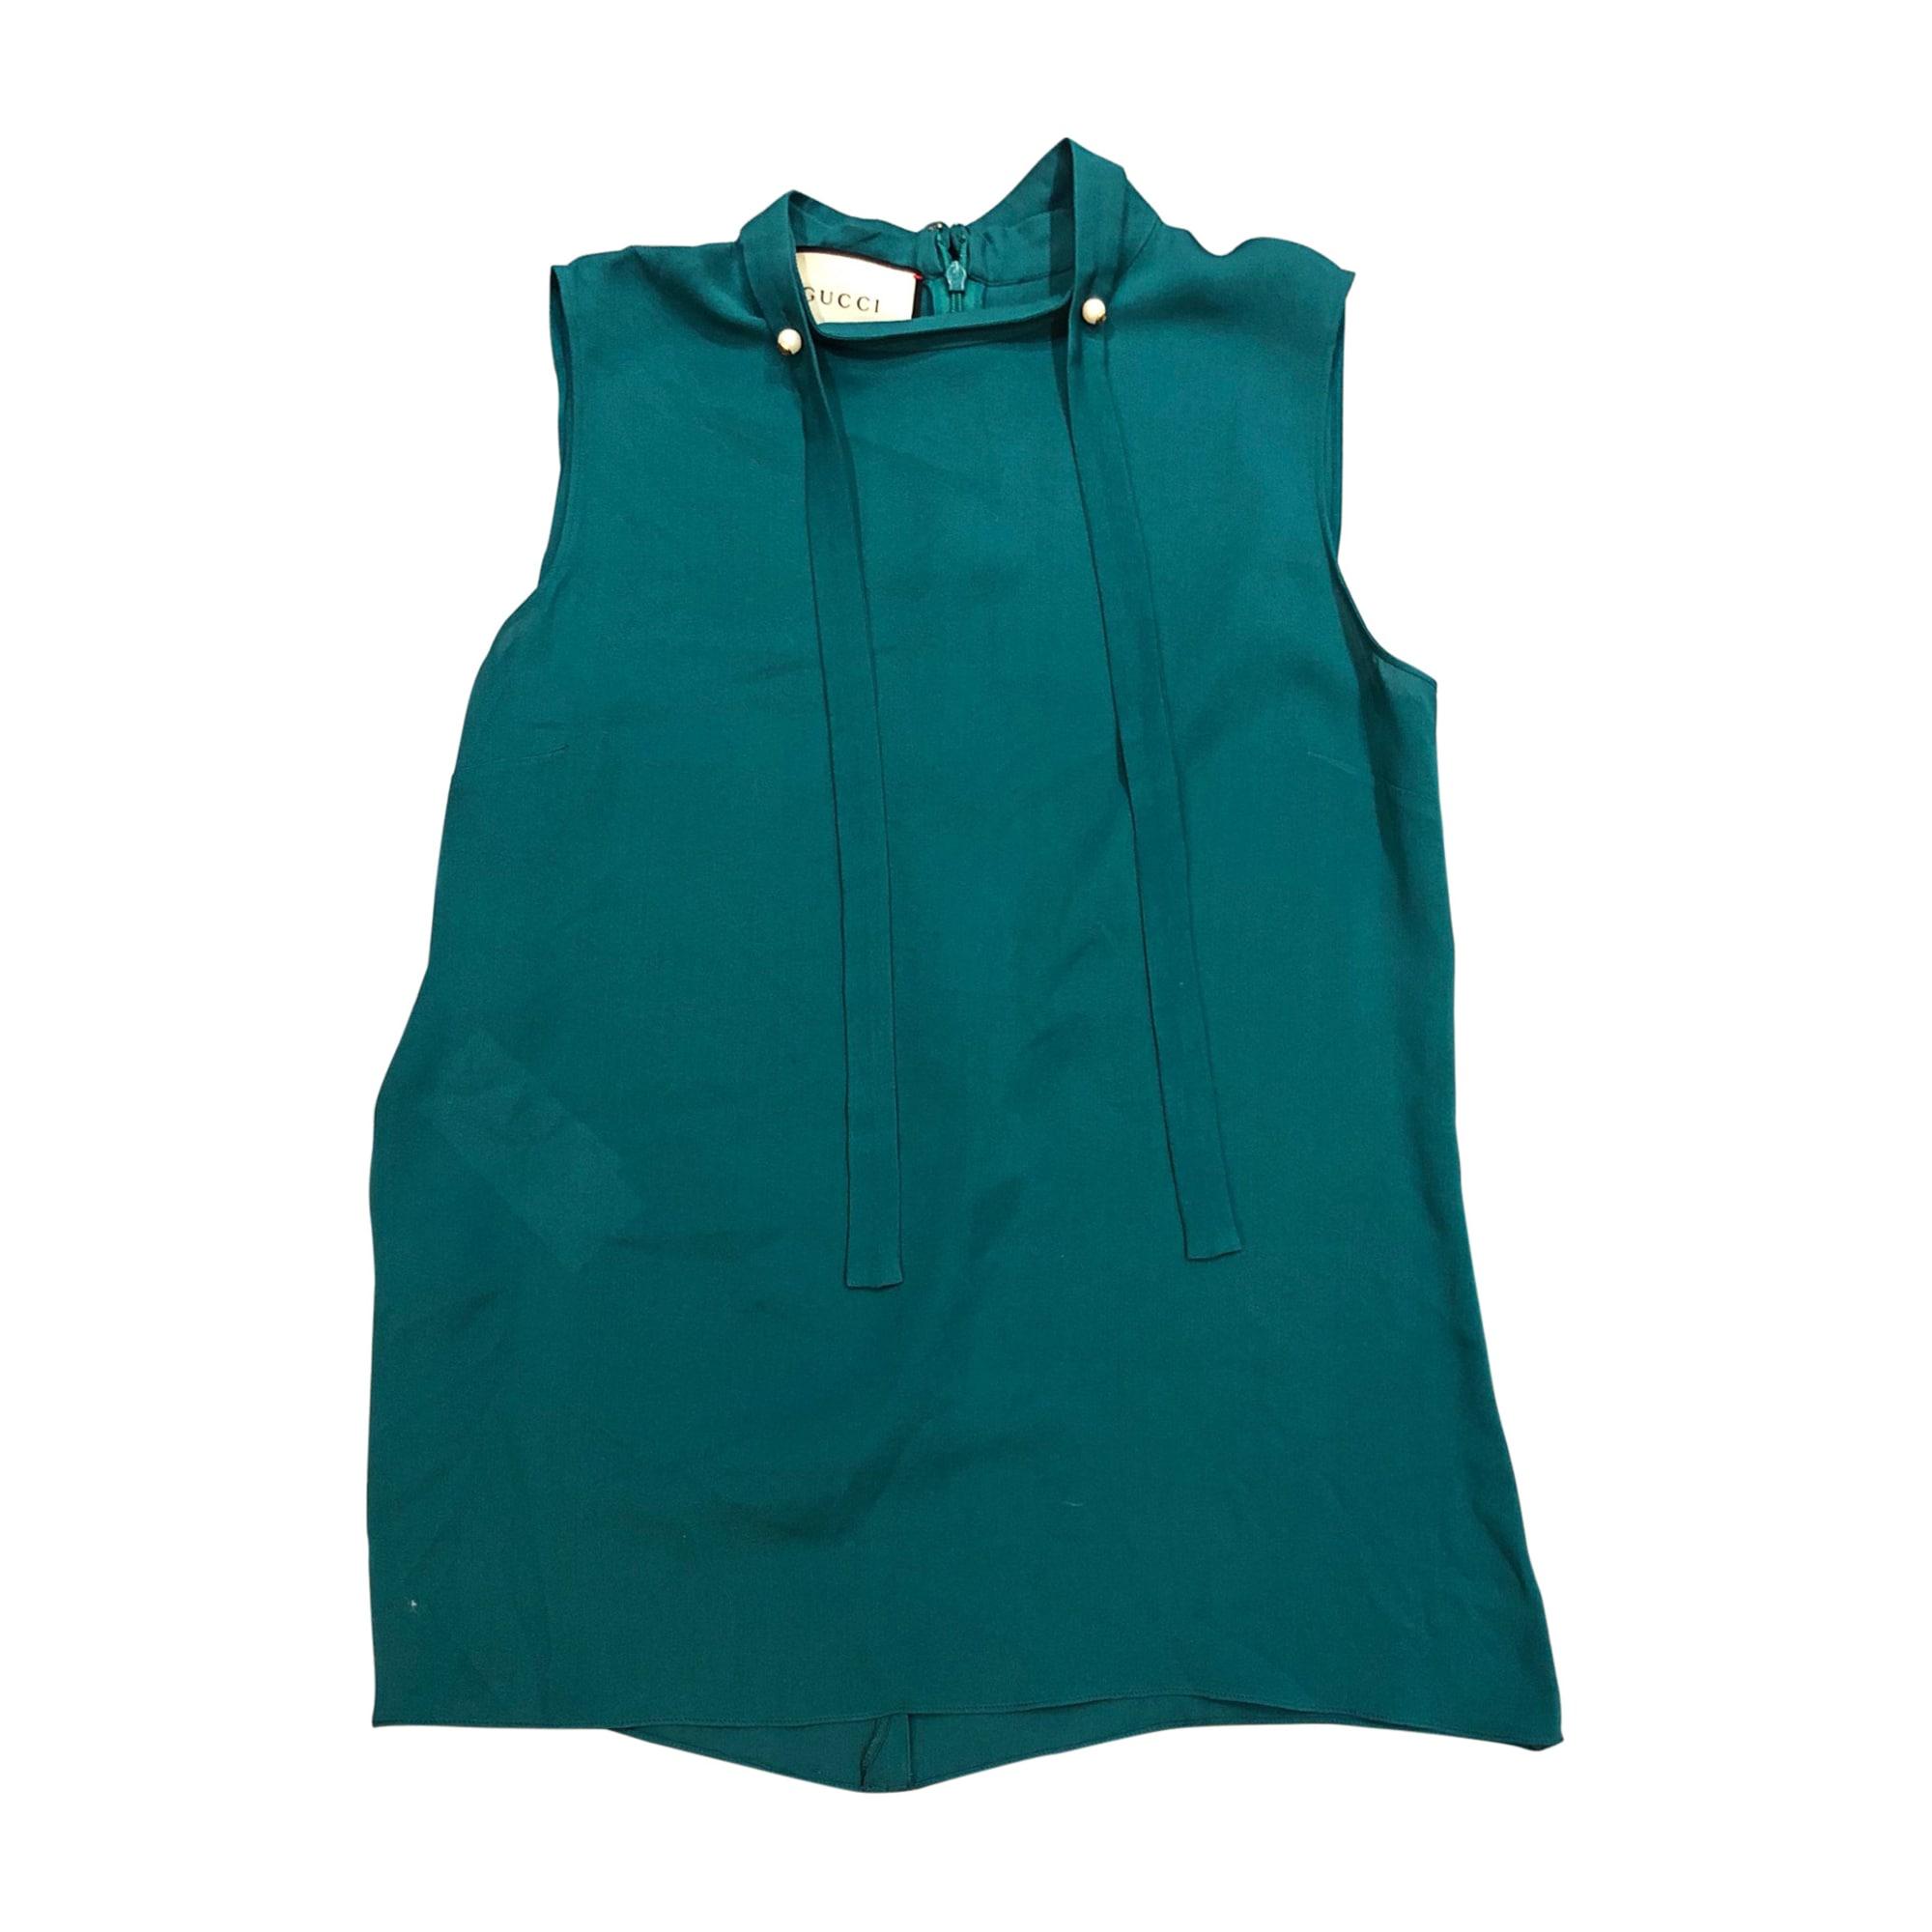 Blouse GUCCI Green